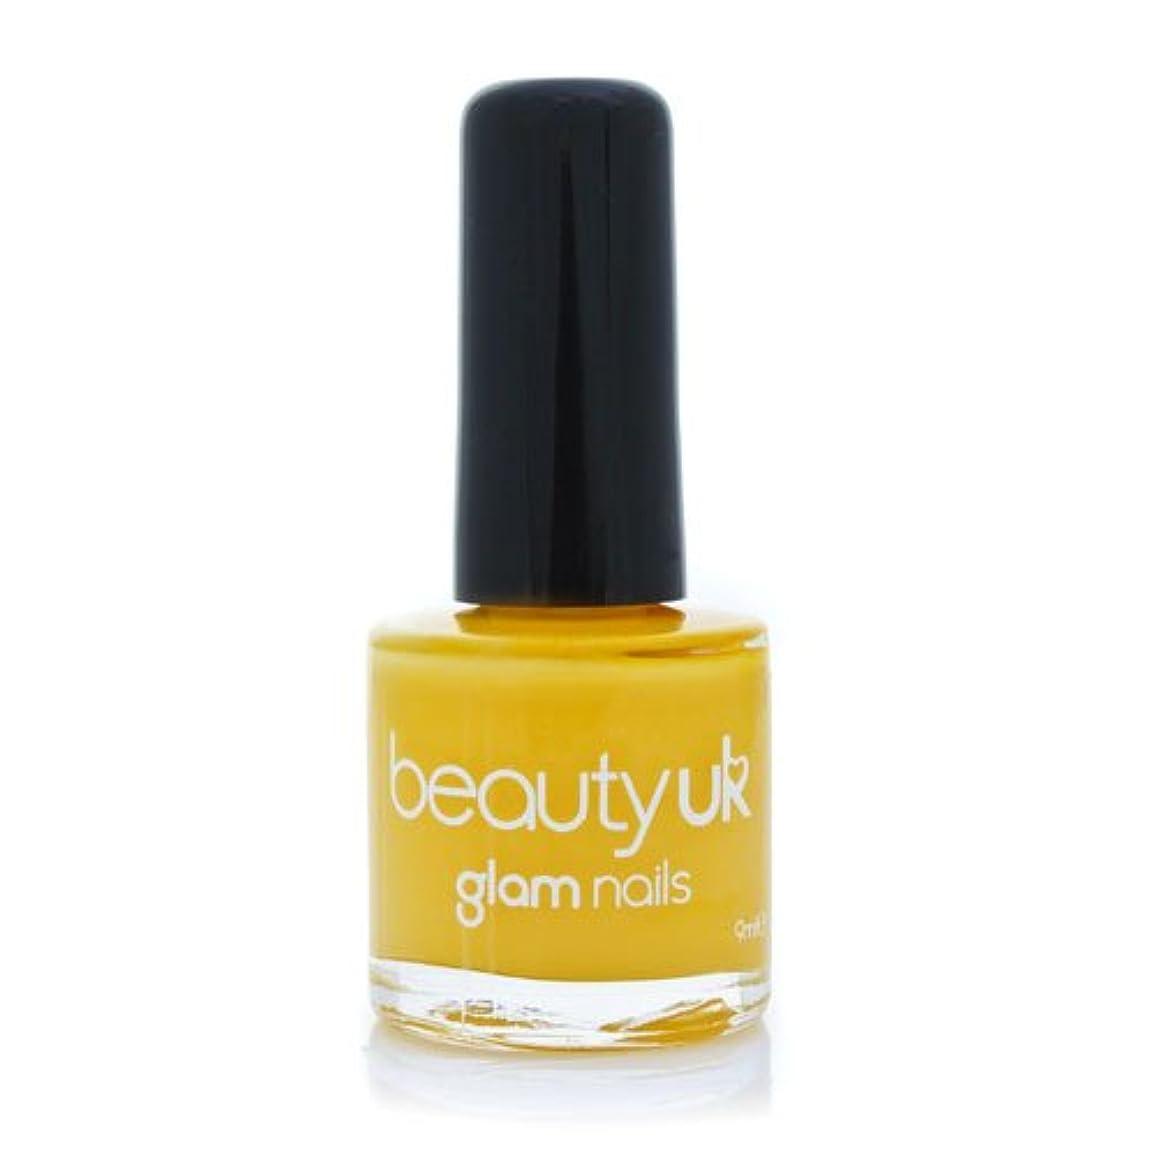 水平量豚肉Beauty Uk Glam Nails No36 Yellow Peril 9ml [並行輸入品]